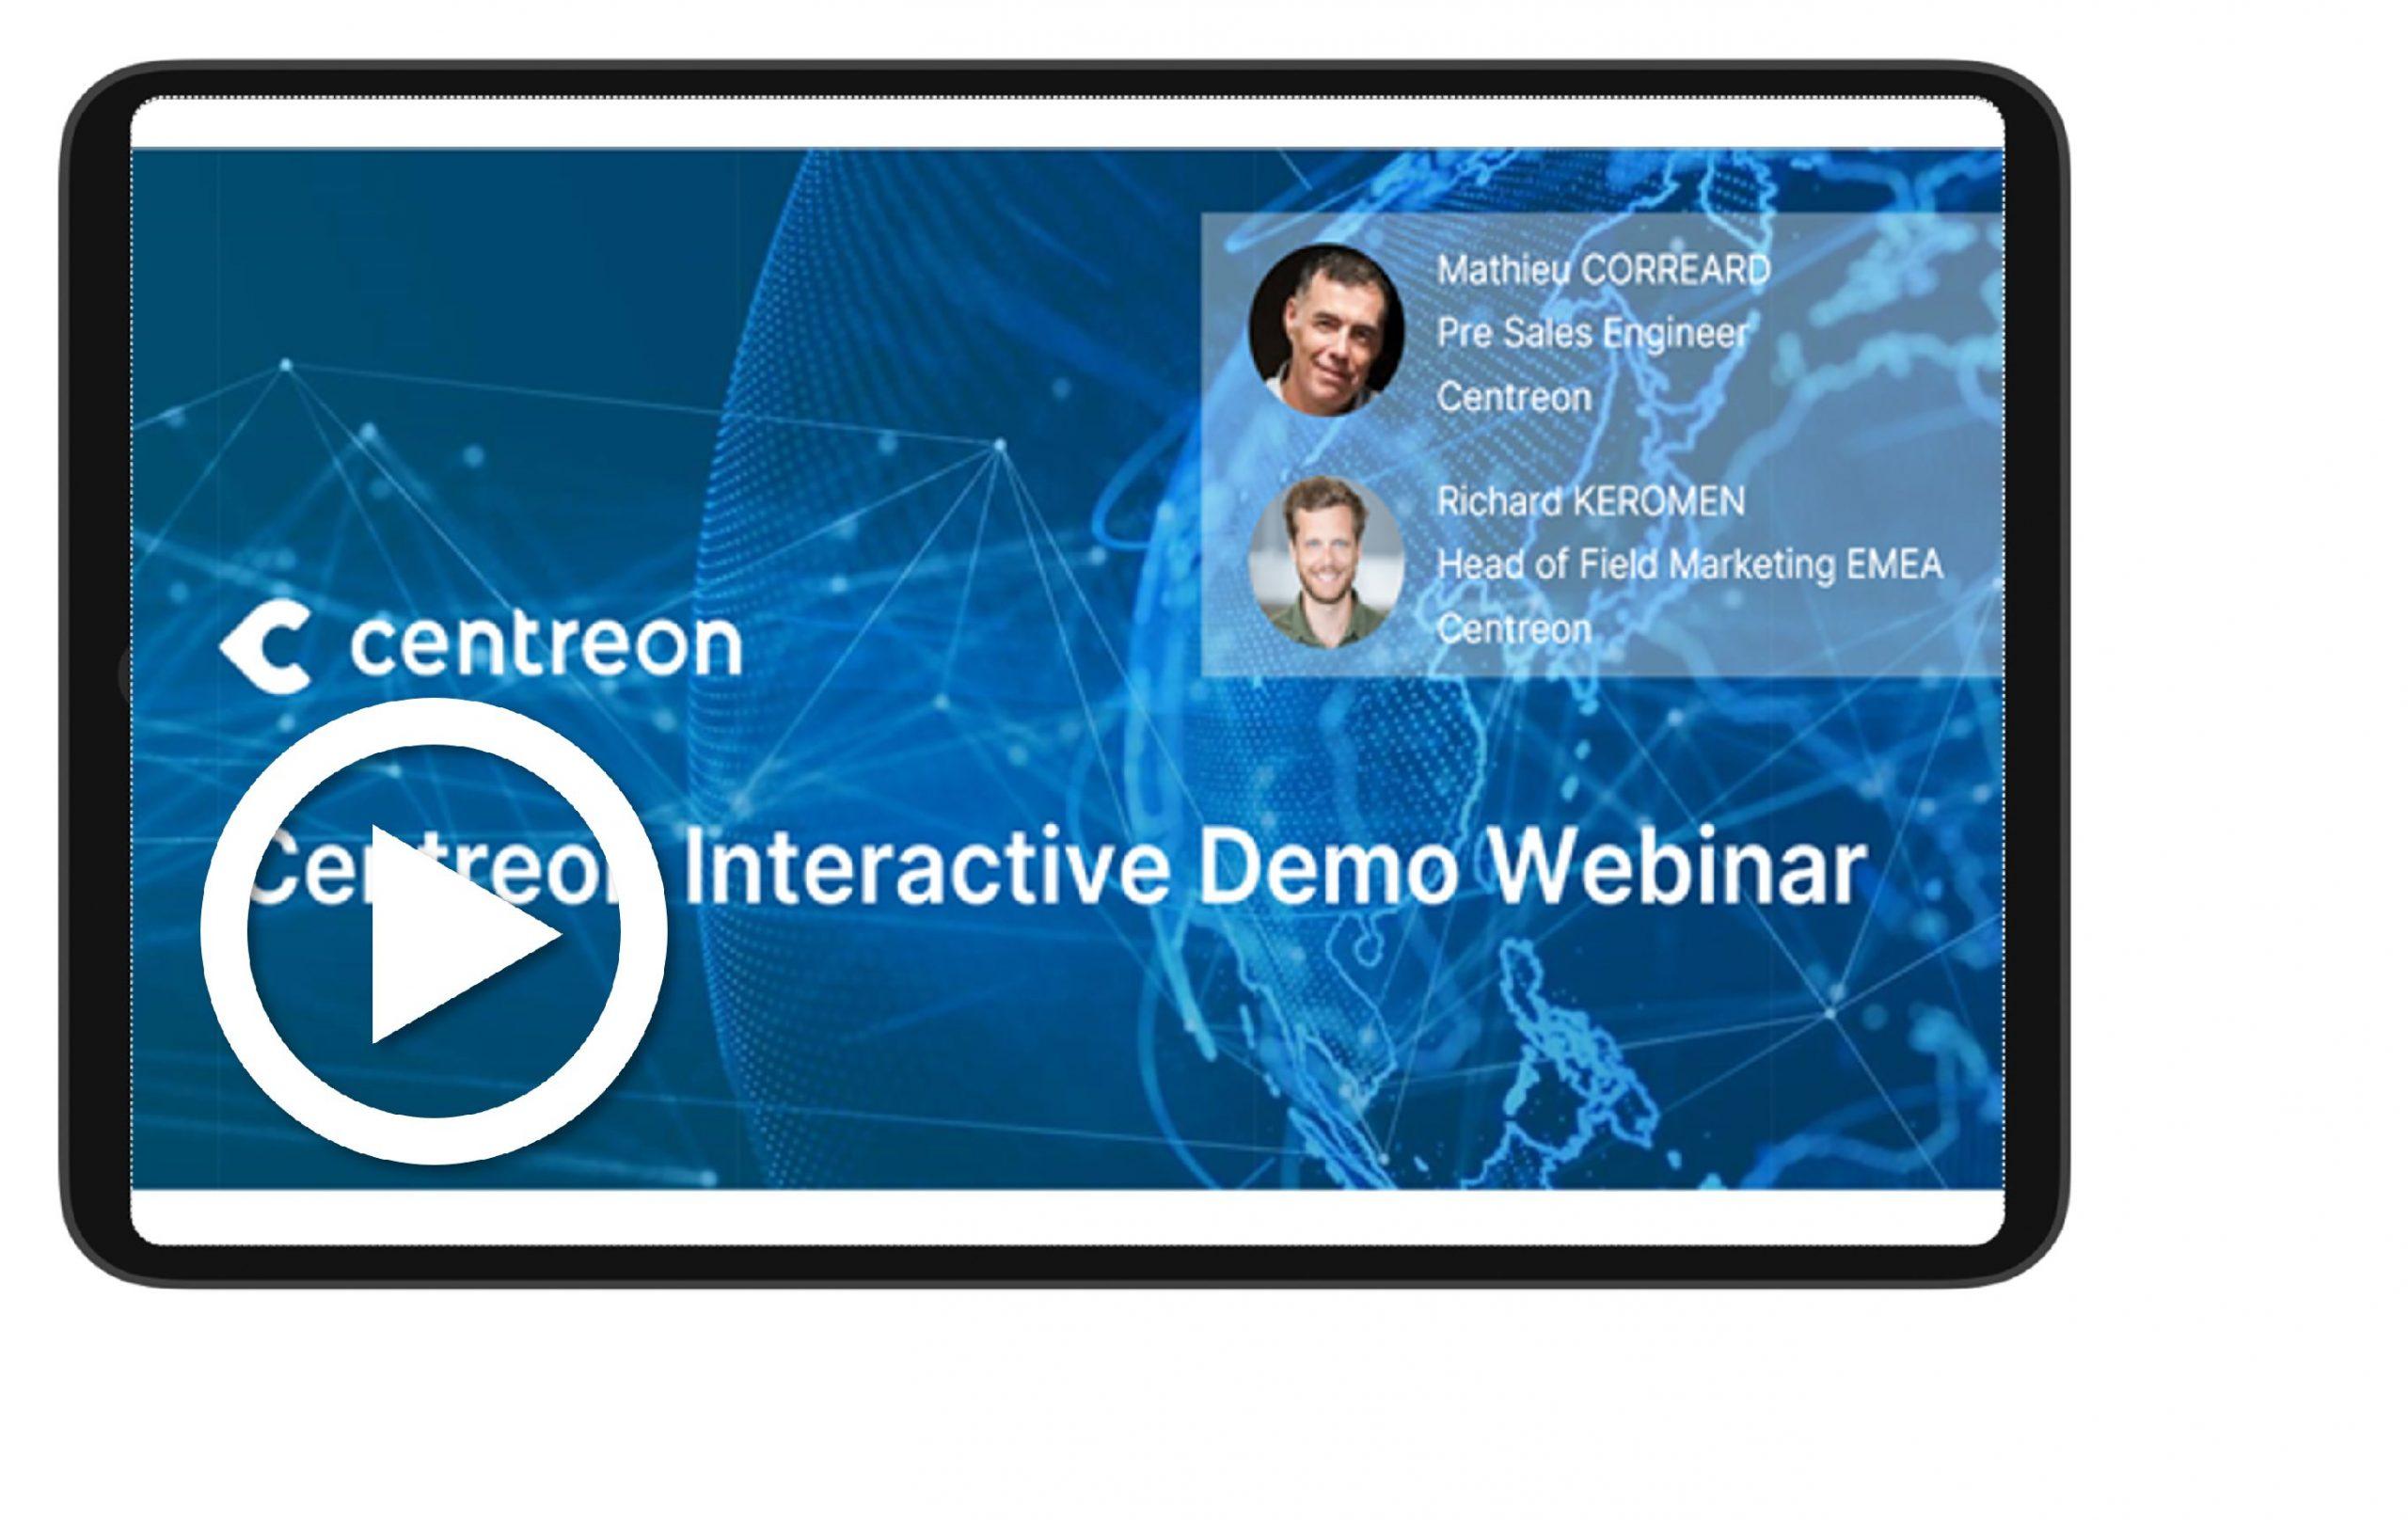 Centreon Interactive Demo